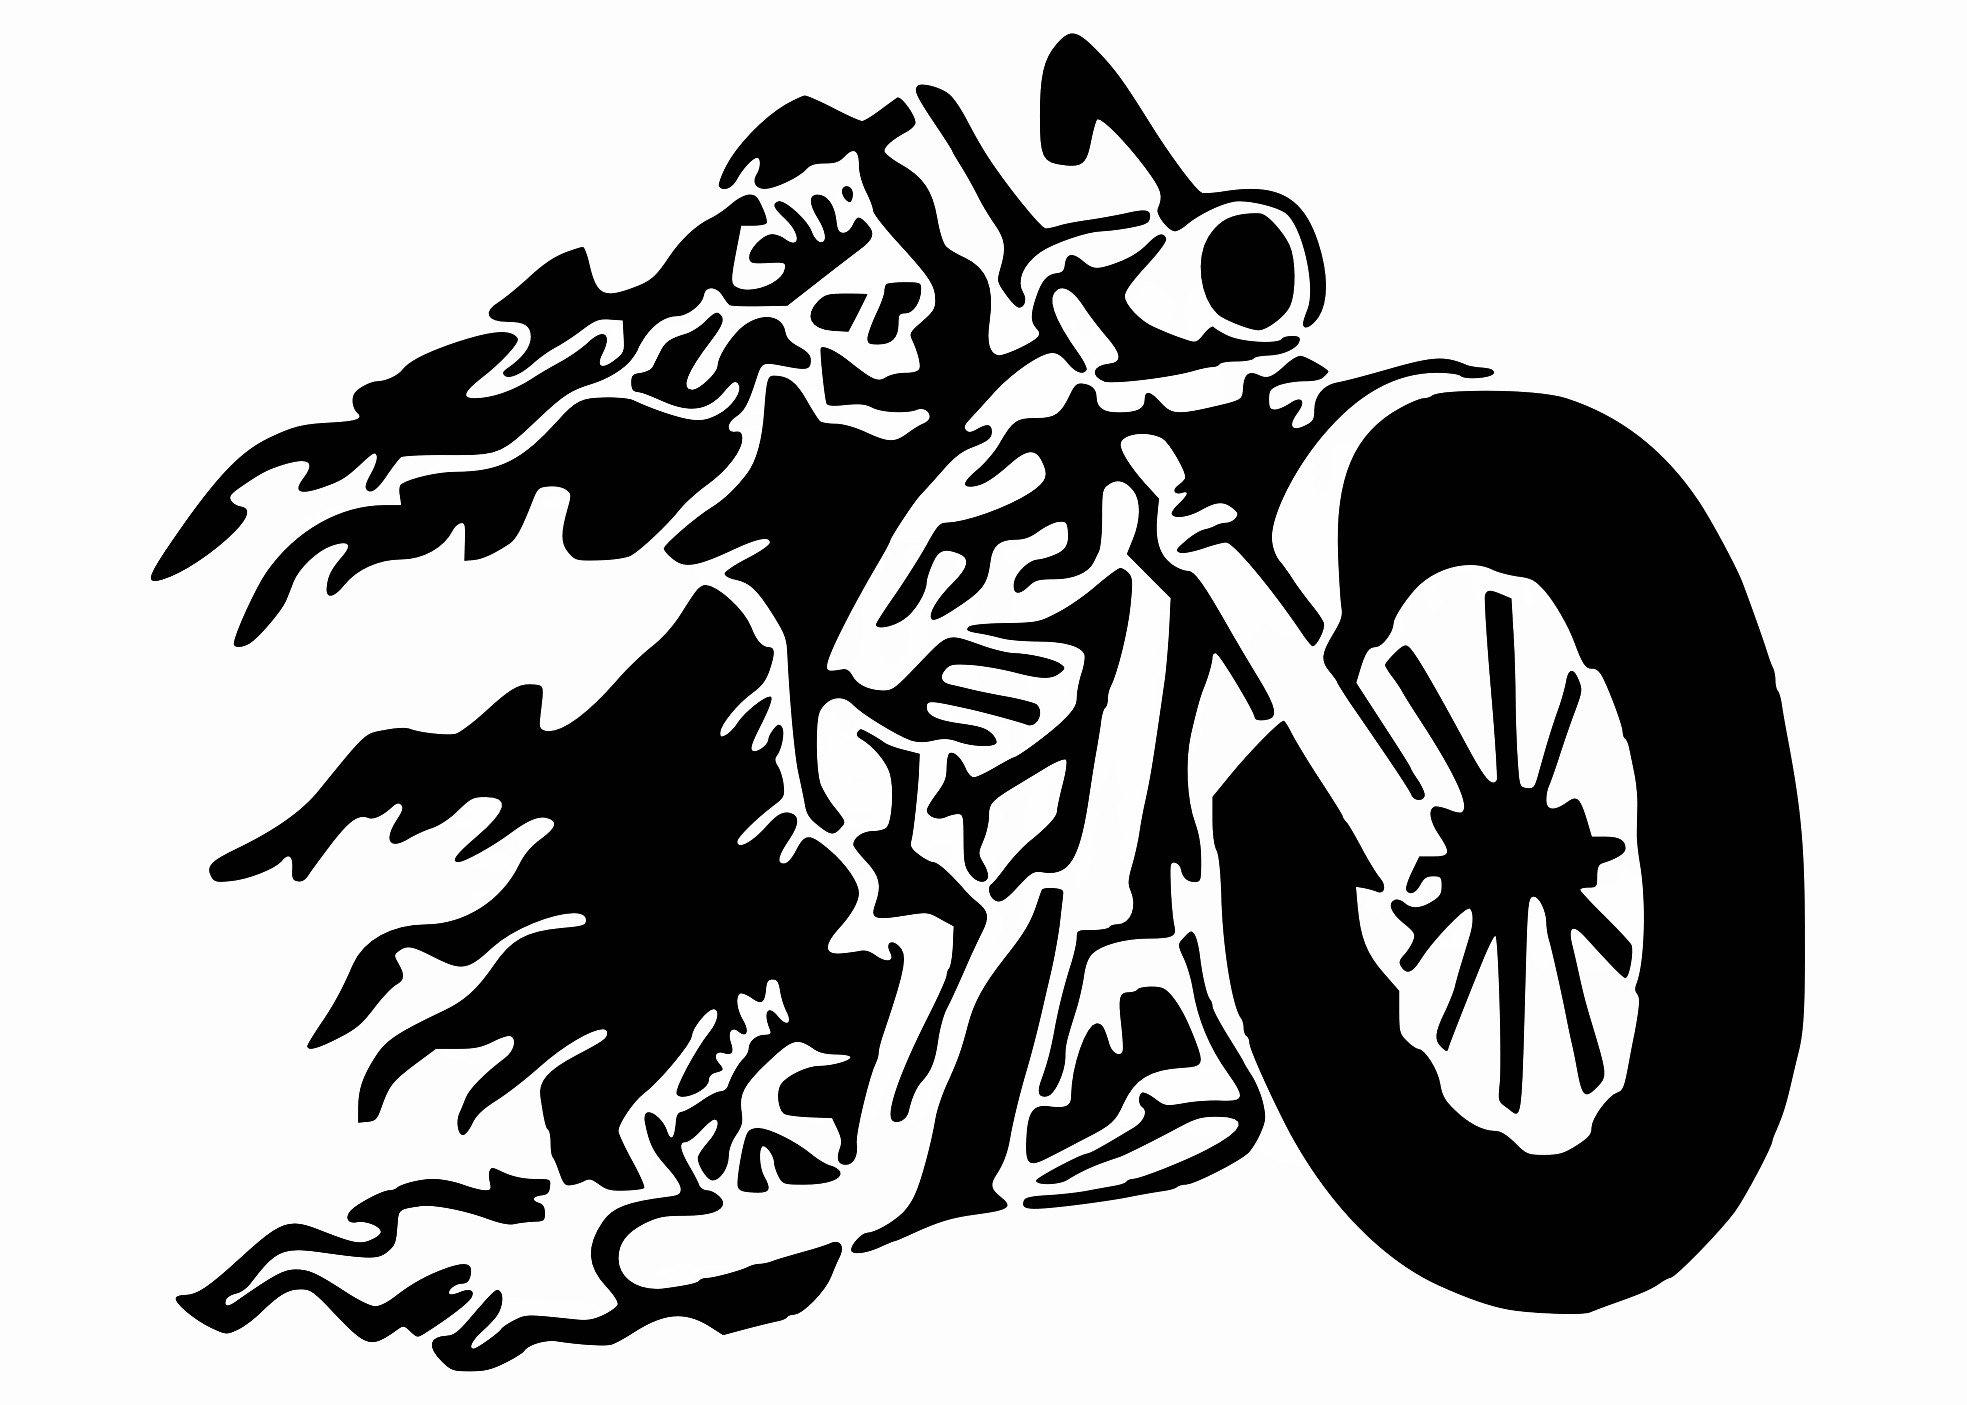 Biker Reaper stencil